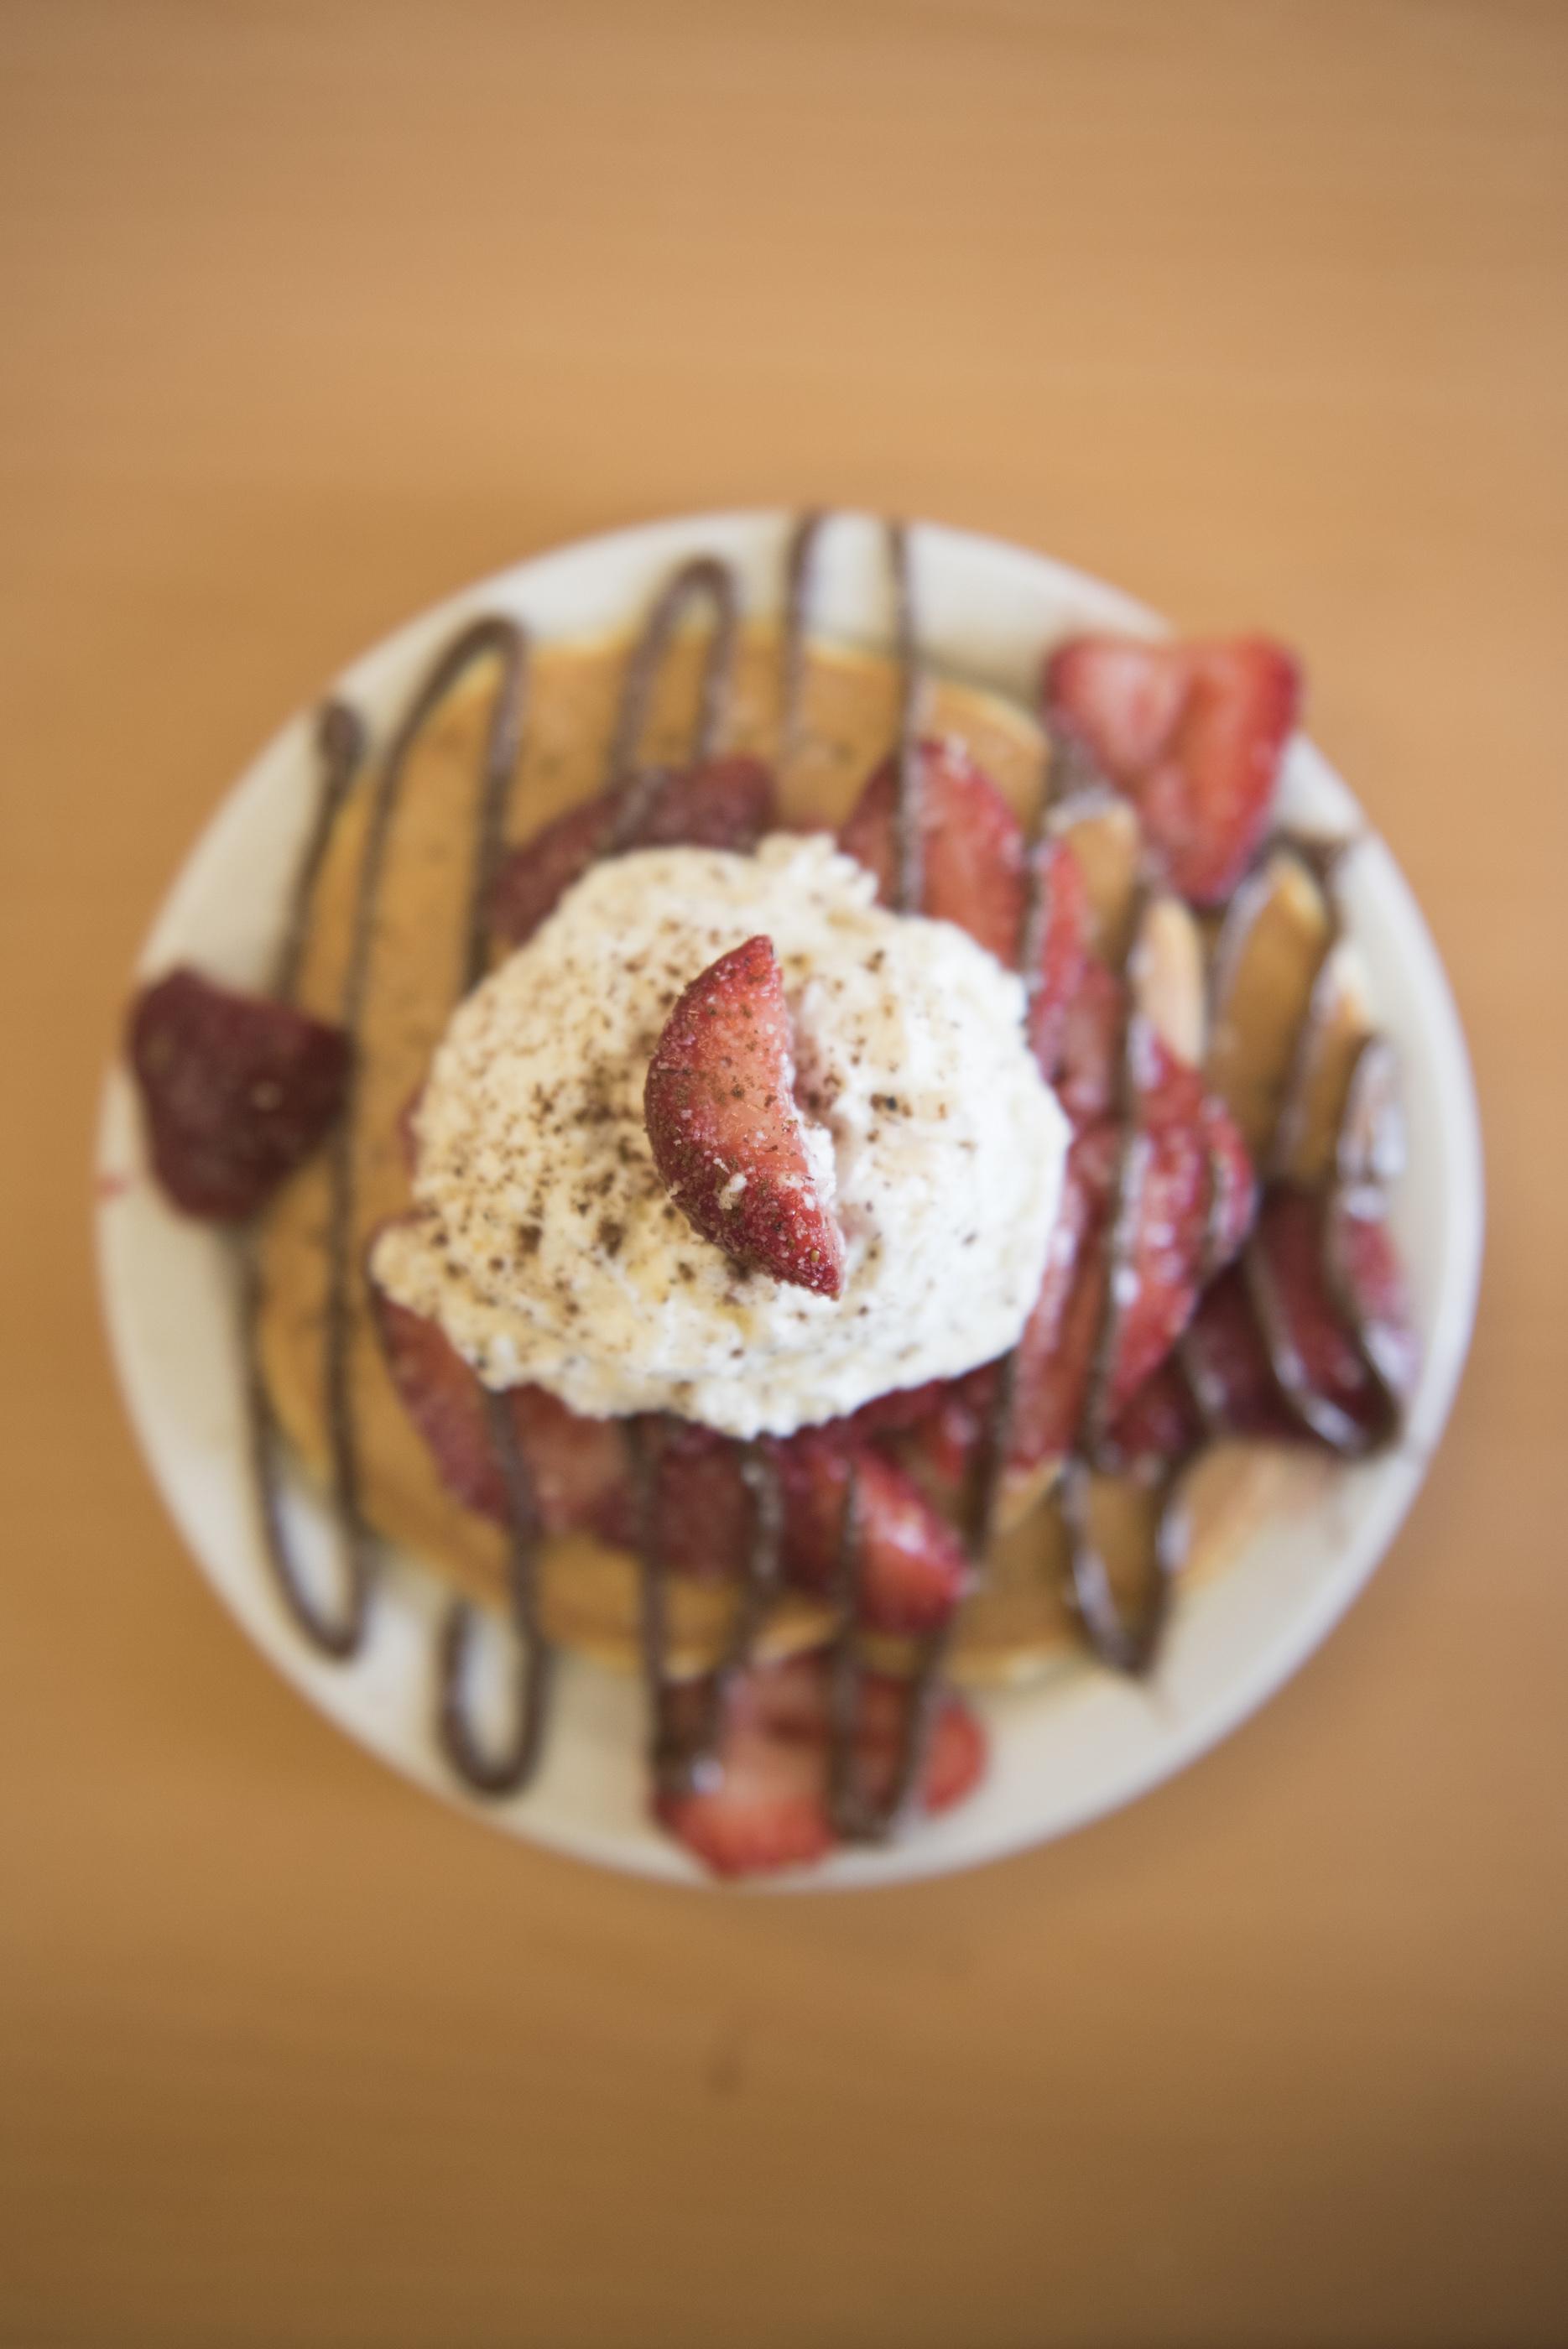 Hazelnut Pancakes with Strawberries is shown at BabyStacks in Henderson, Friday, June 26, 2015.(Jason Ogulnik/Las Vegas Review-Journal)